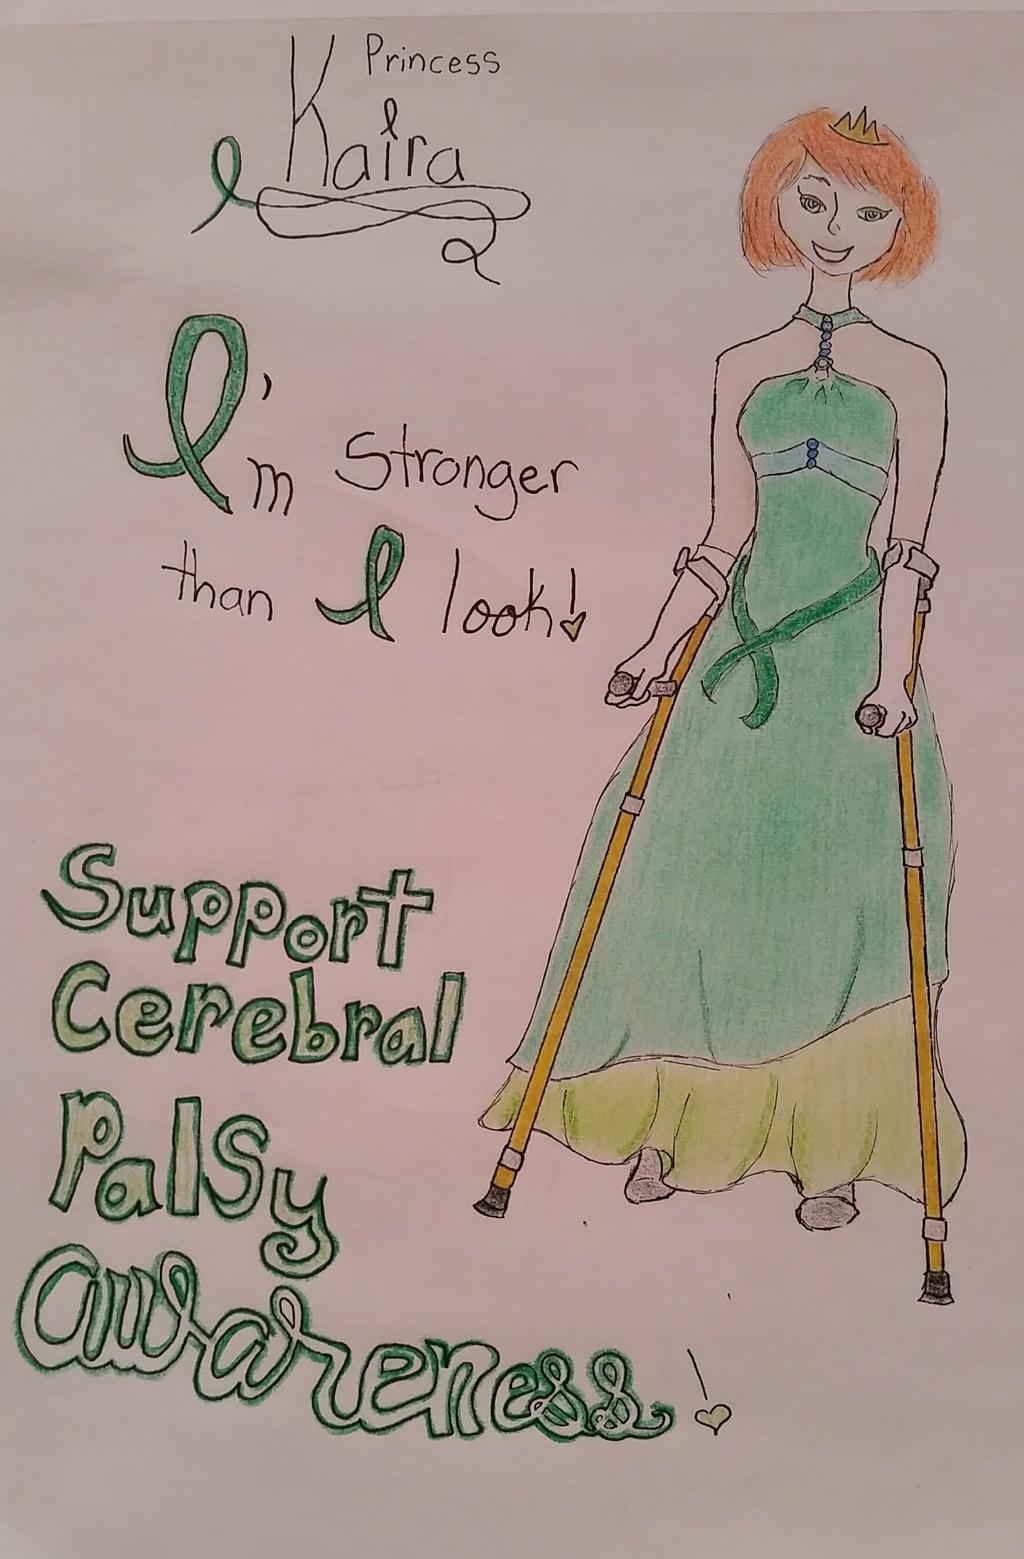 Cerebral Palsy Awareness Day 2015 by MermaidKisa on DeviantArt